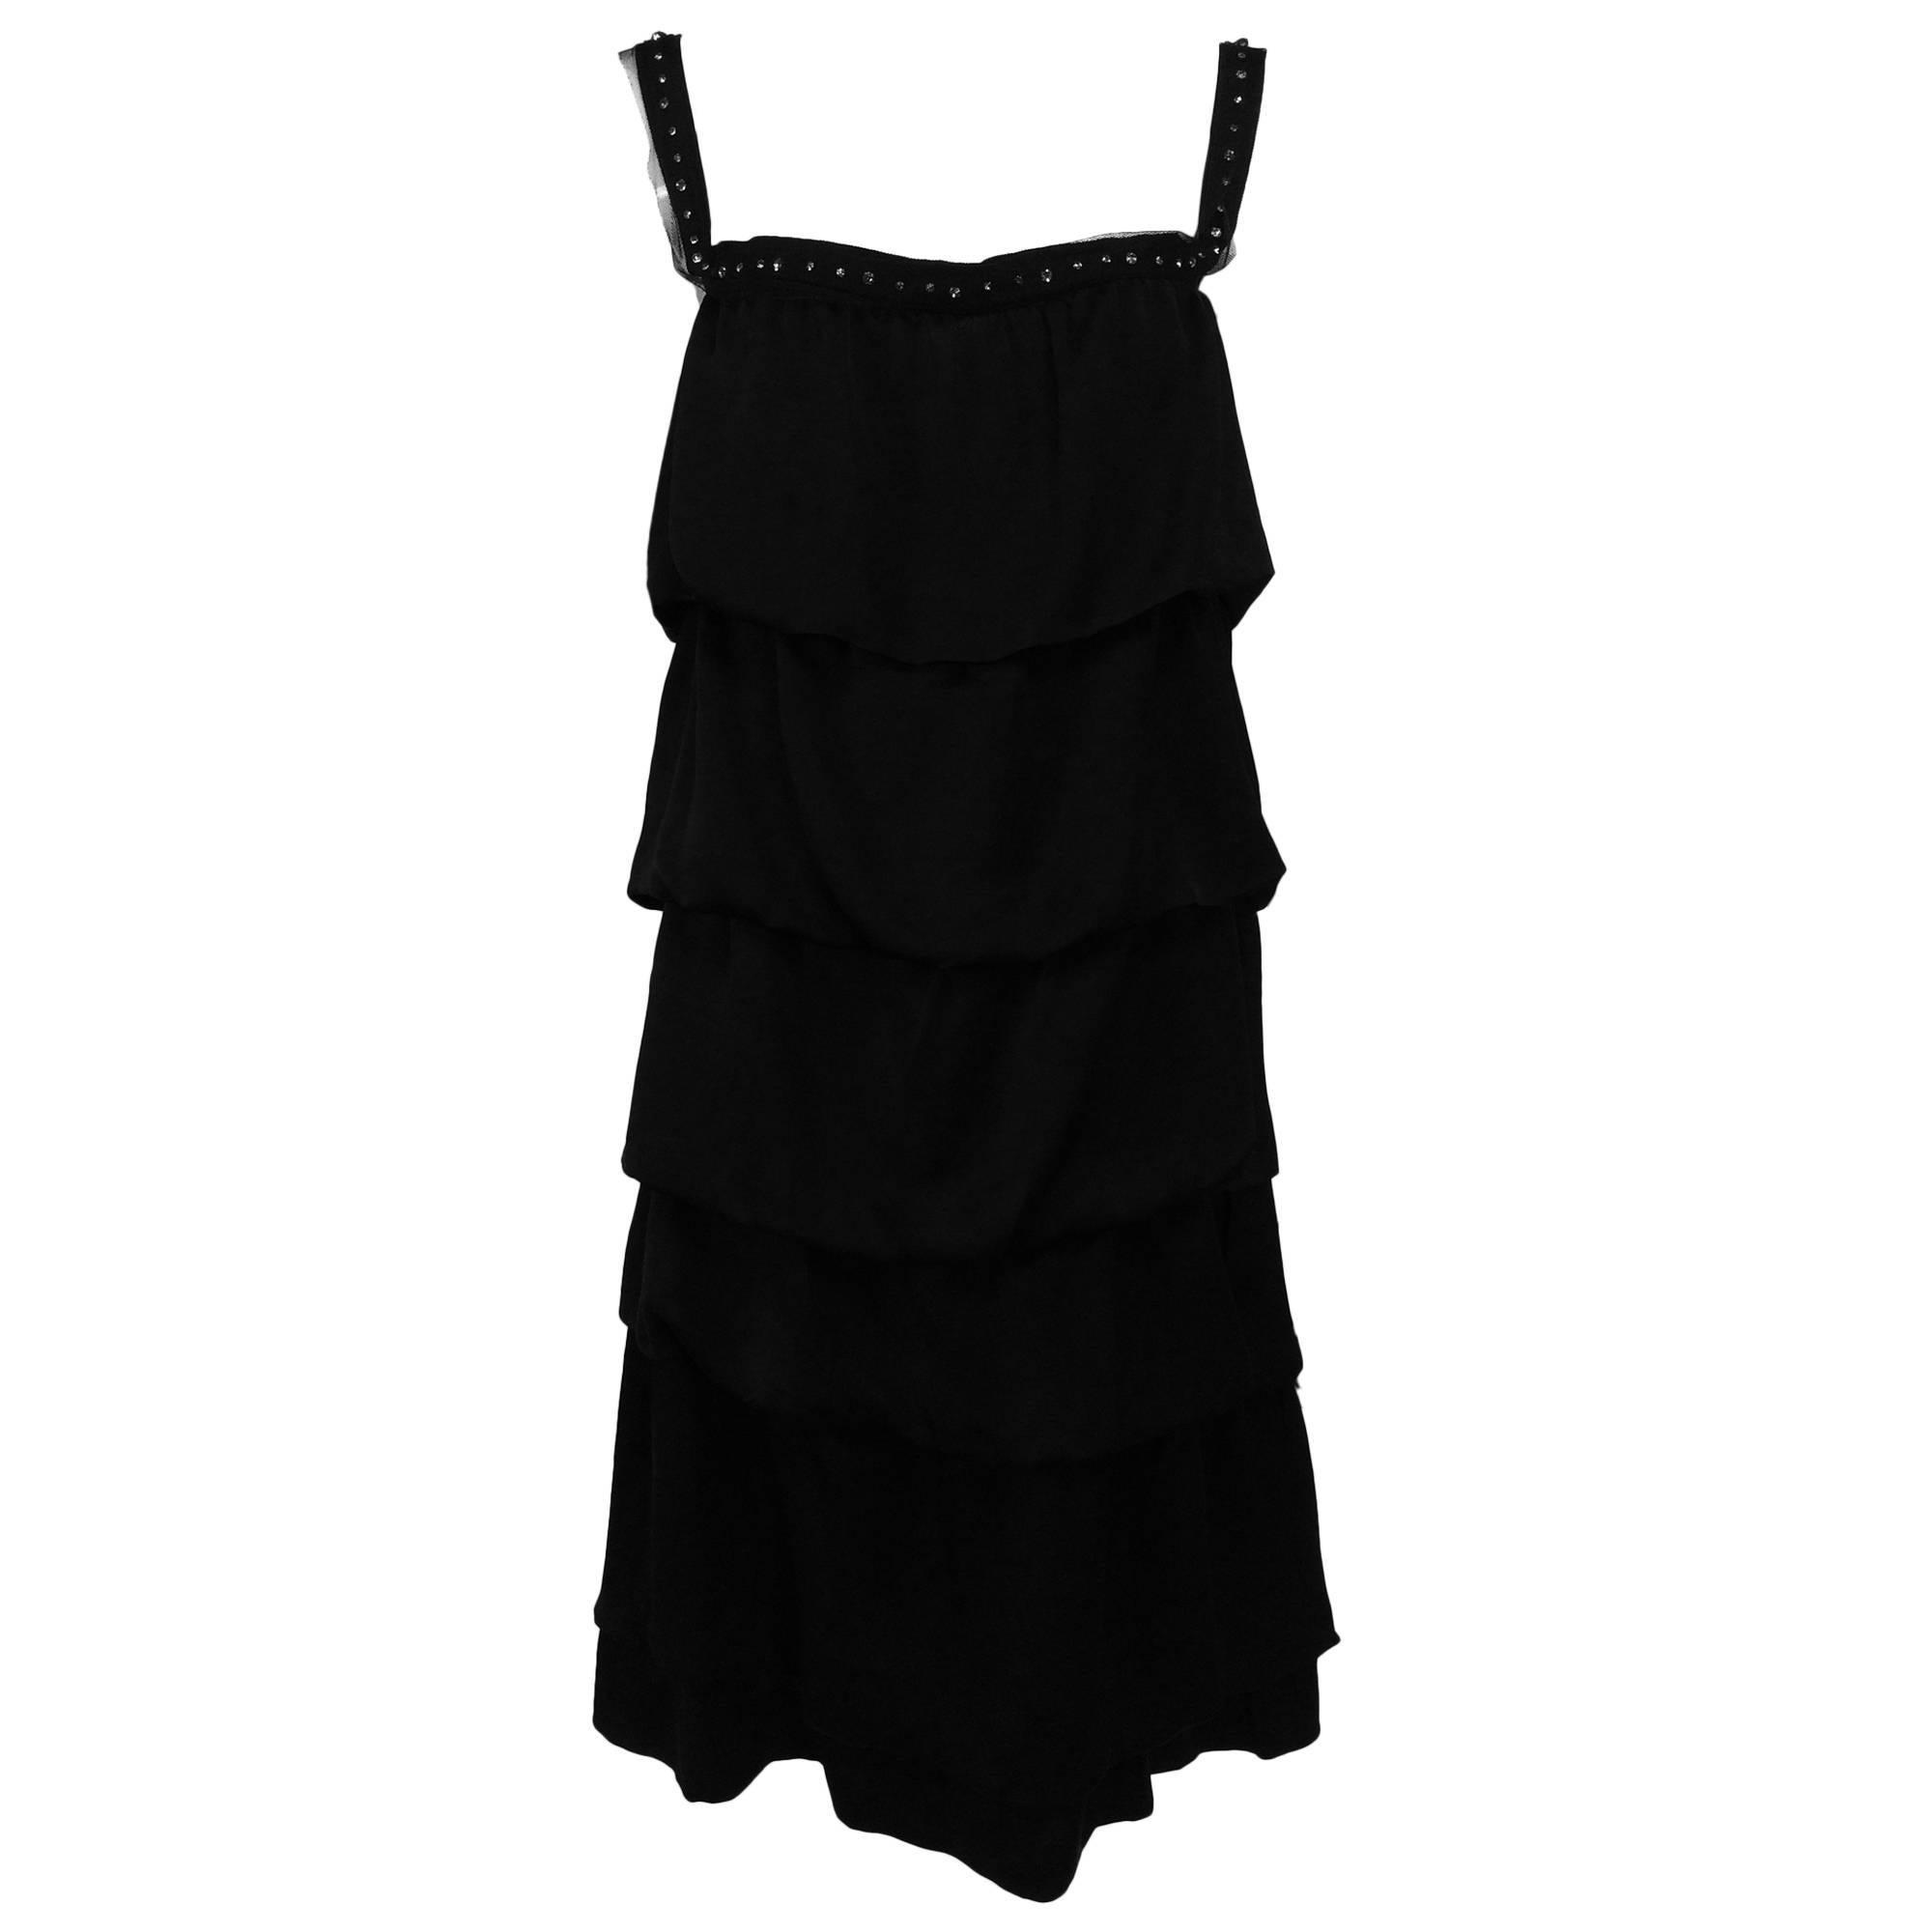 Lanvin Paris black silk tiered ruffle rhinestone shoulder 20s influenced dress